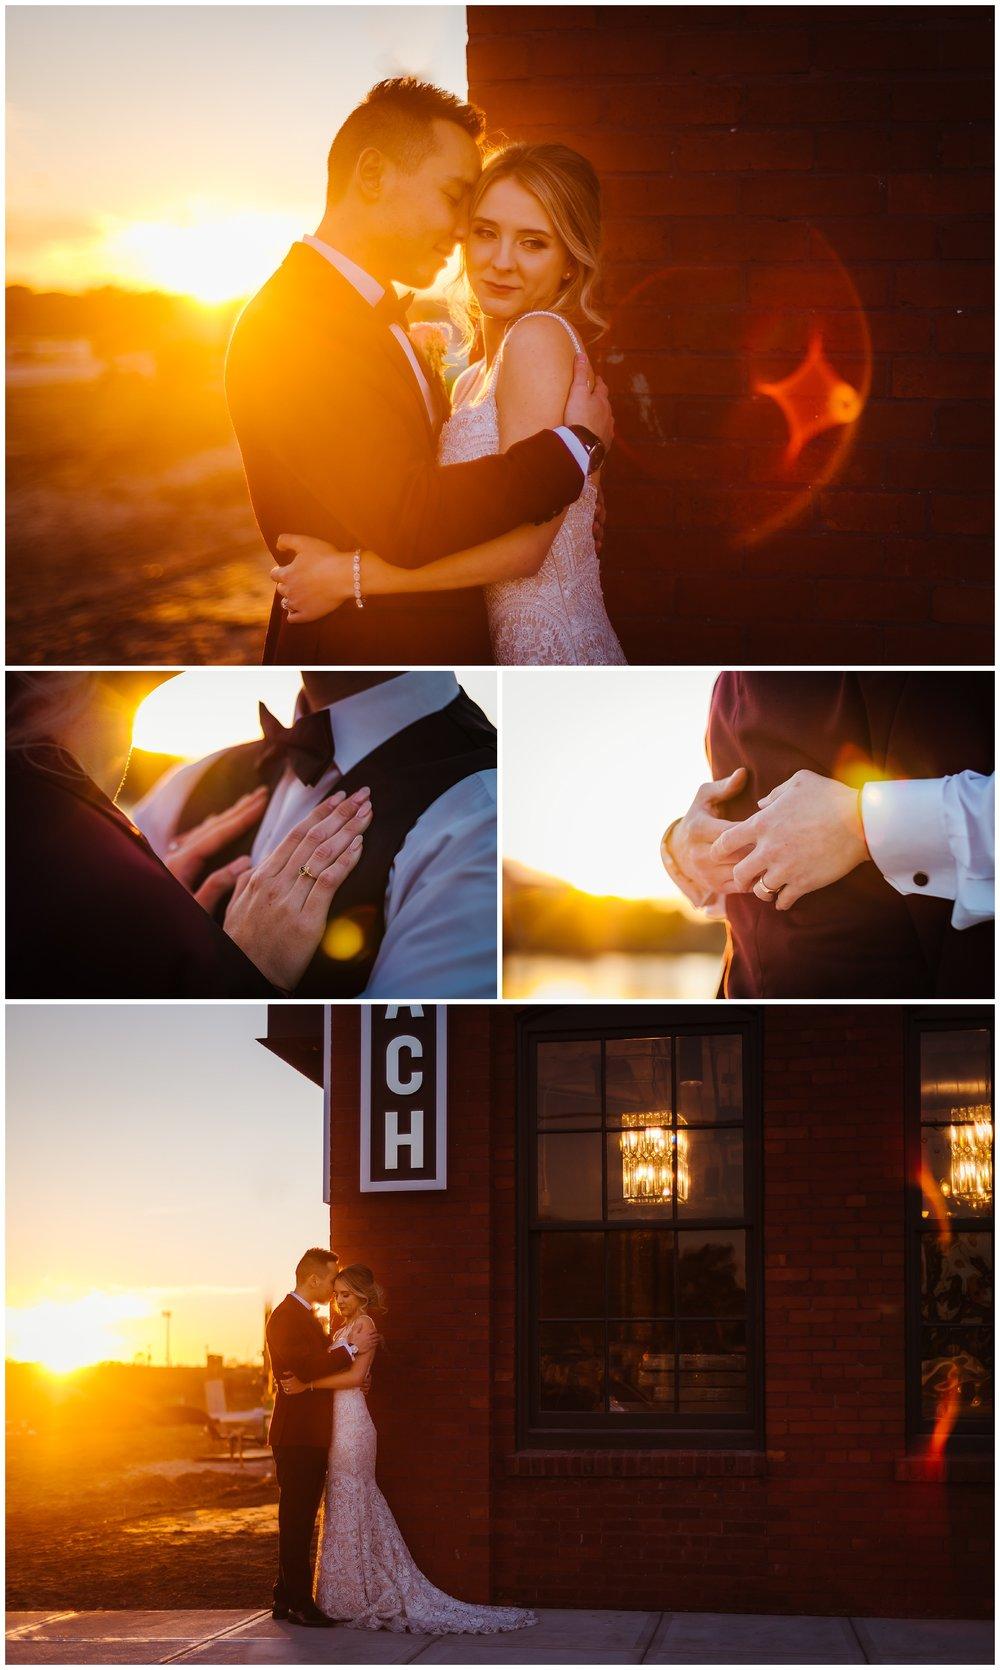 tampa-armeture-wedding-photographer-edgy-industrial-downtown-fancy-free-nursery-tattoo-burgandy-velvet_0056.jpg